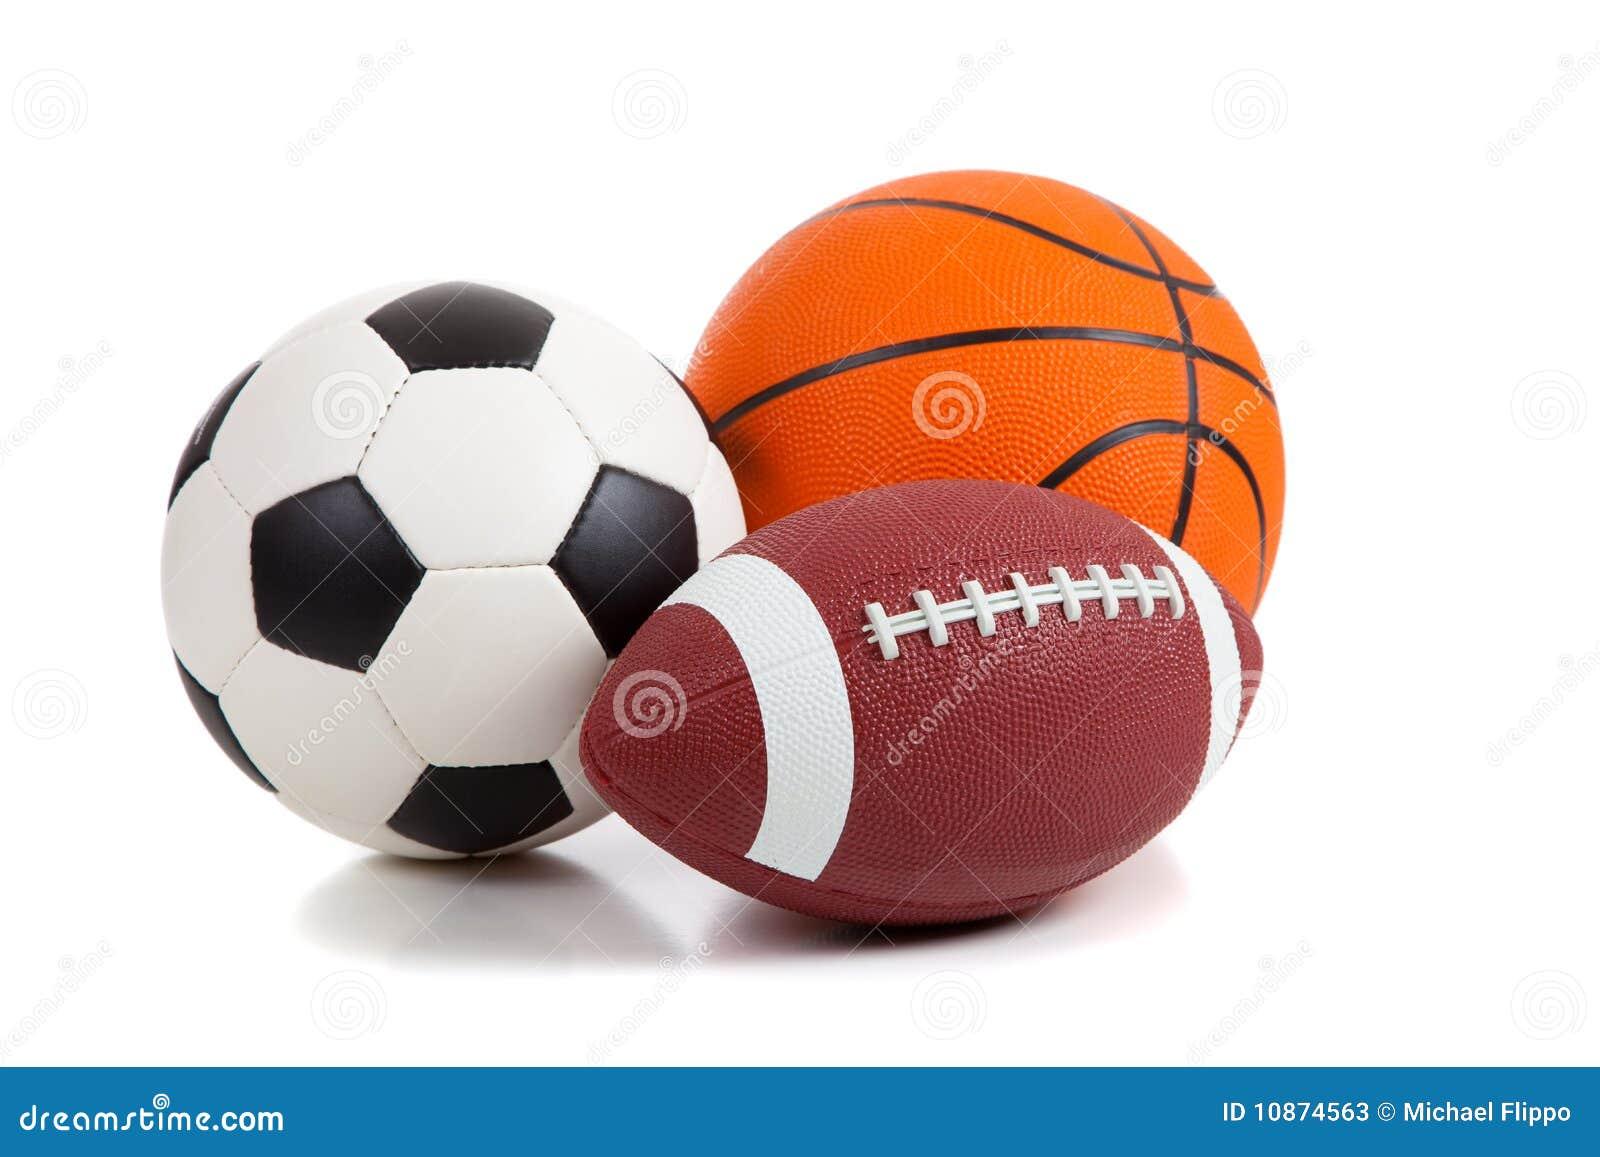 Vector Deportes Bolas Patrón De Fondo: Sports Balls On White Stock Image. Image Of Objects, Group